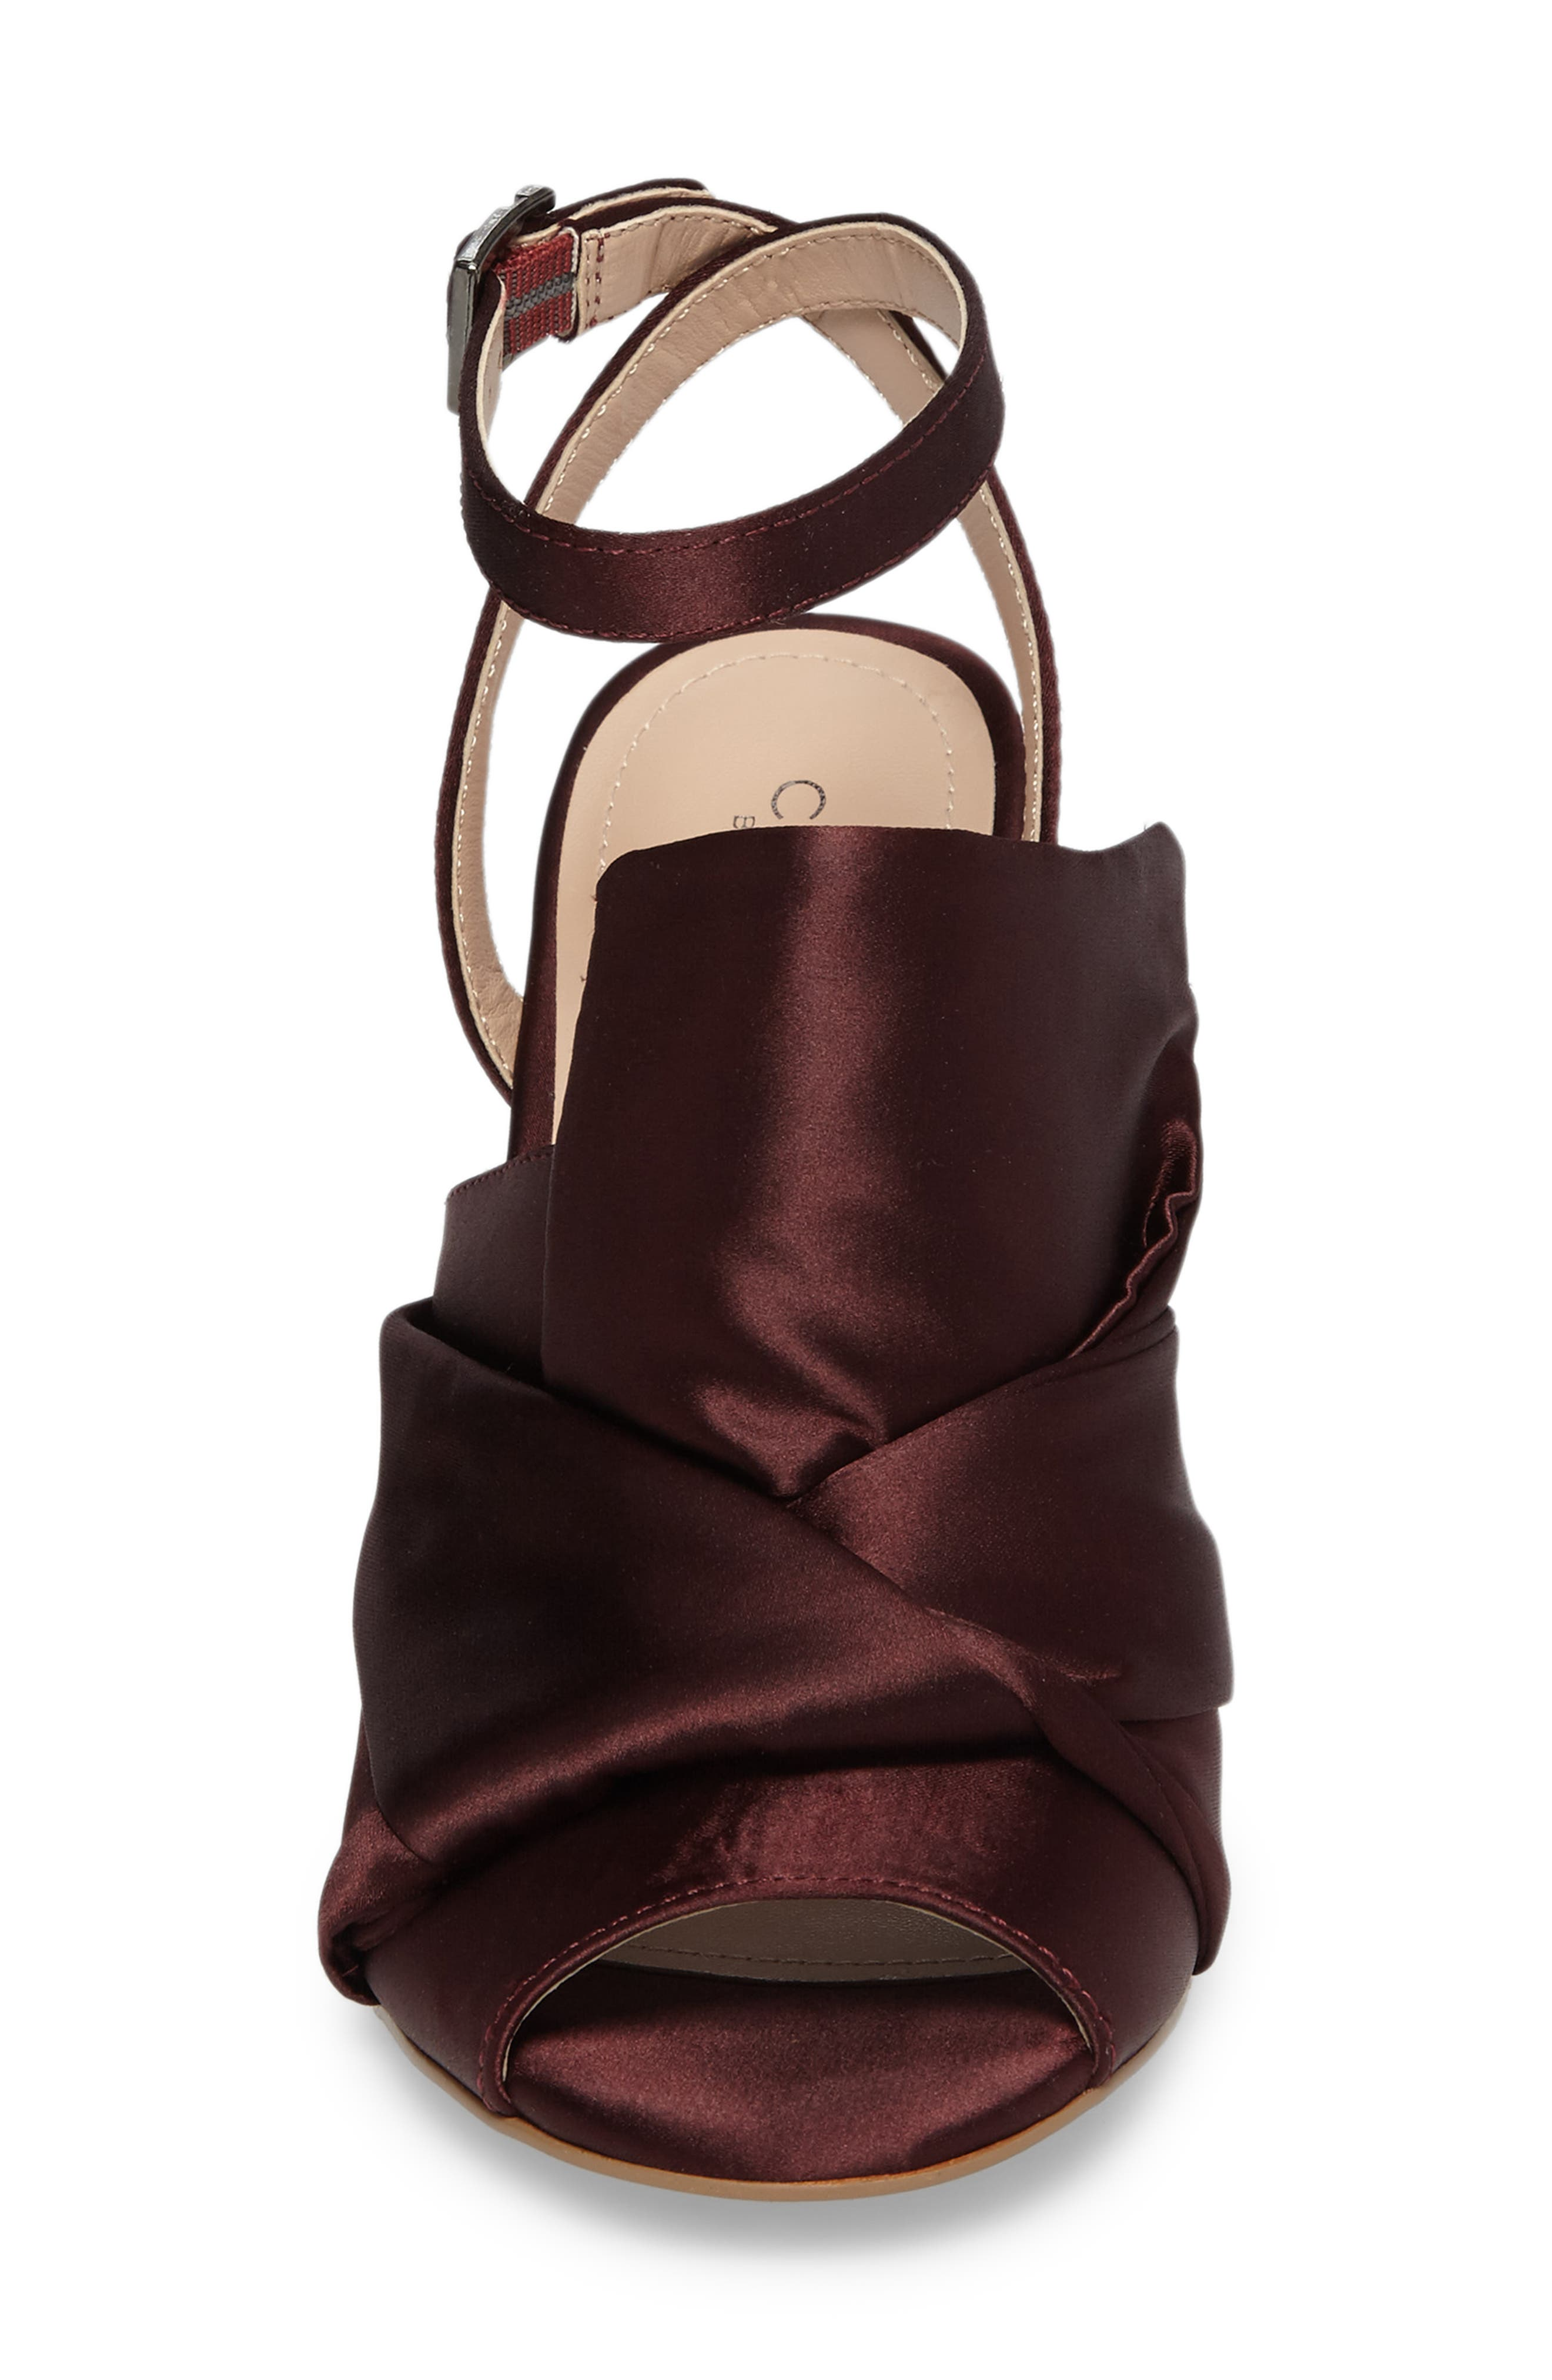 Rachel Ankle Strap Sandal,                             Alternate thumbnail 12, color,